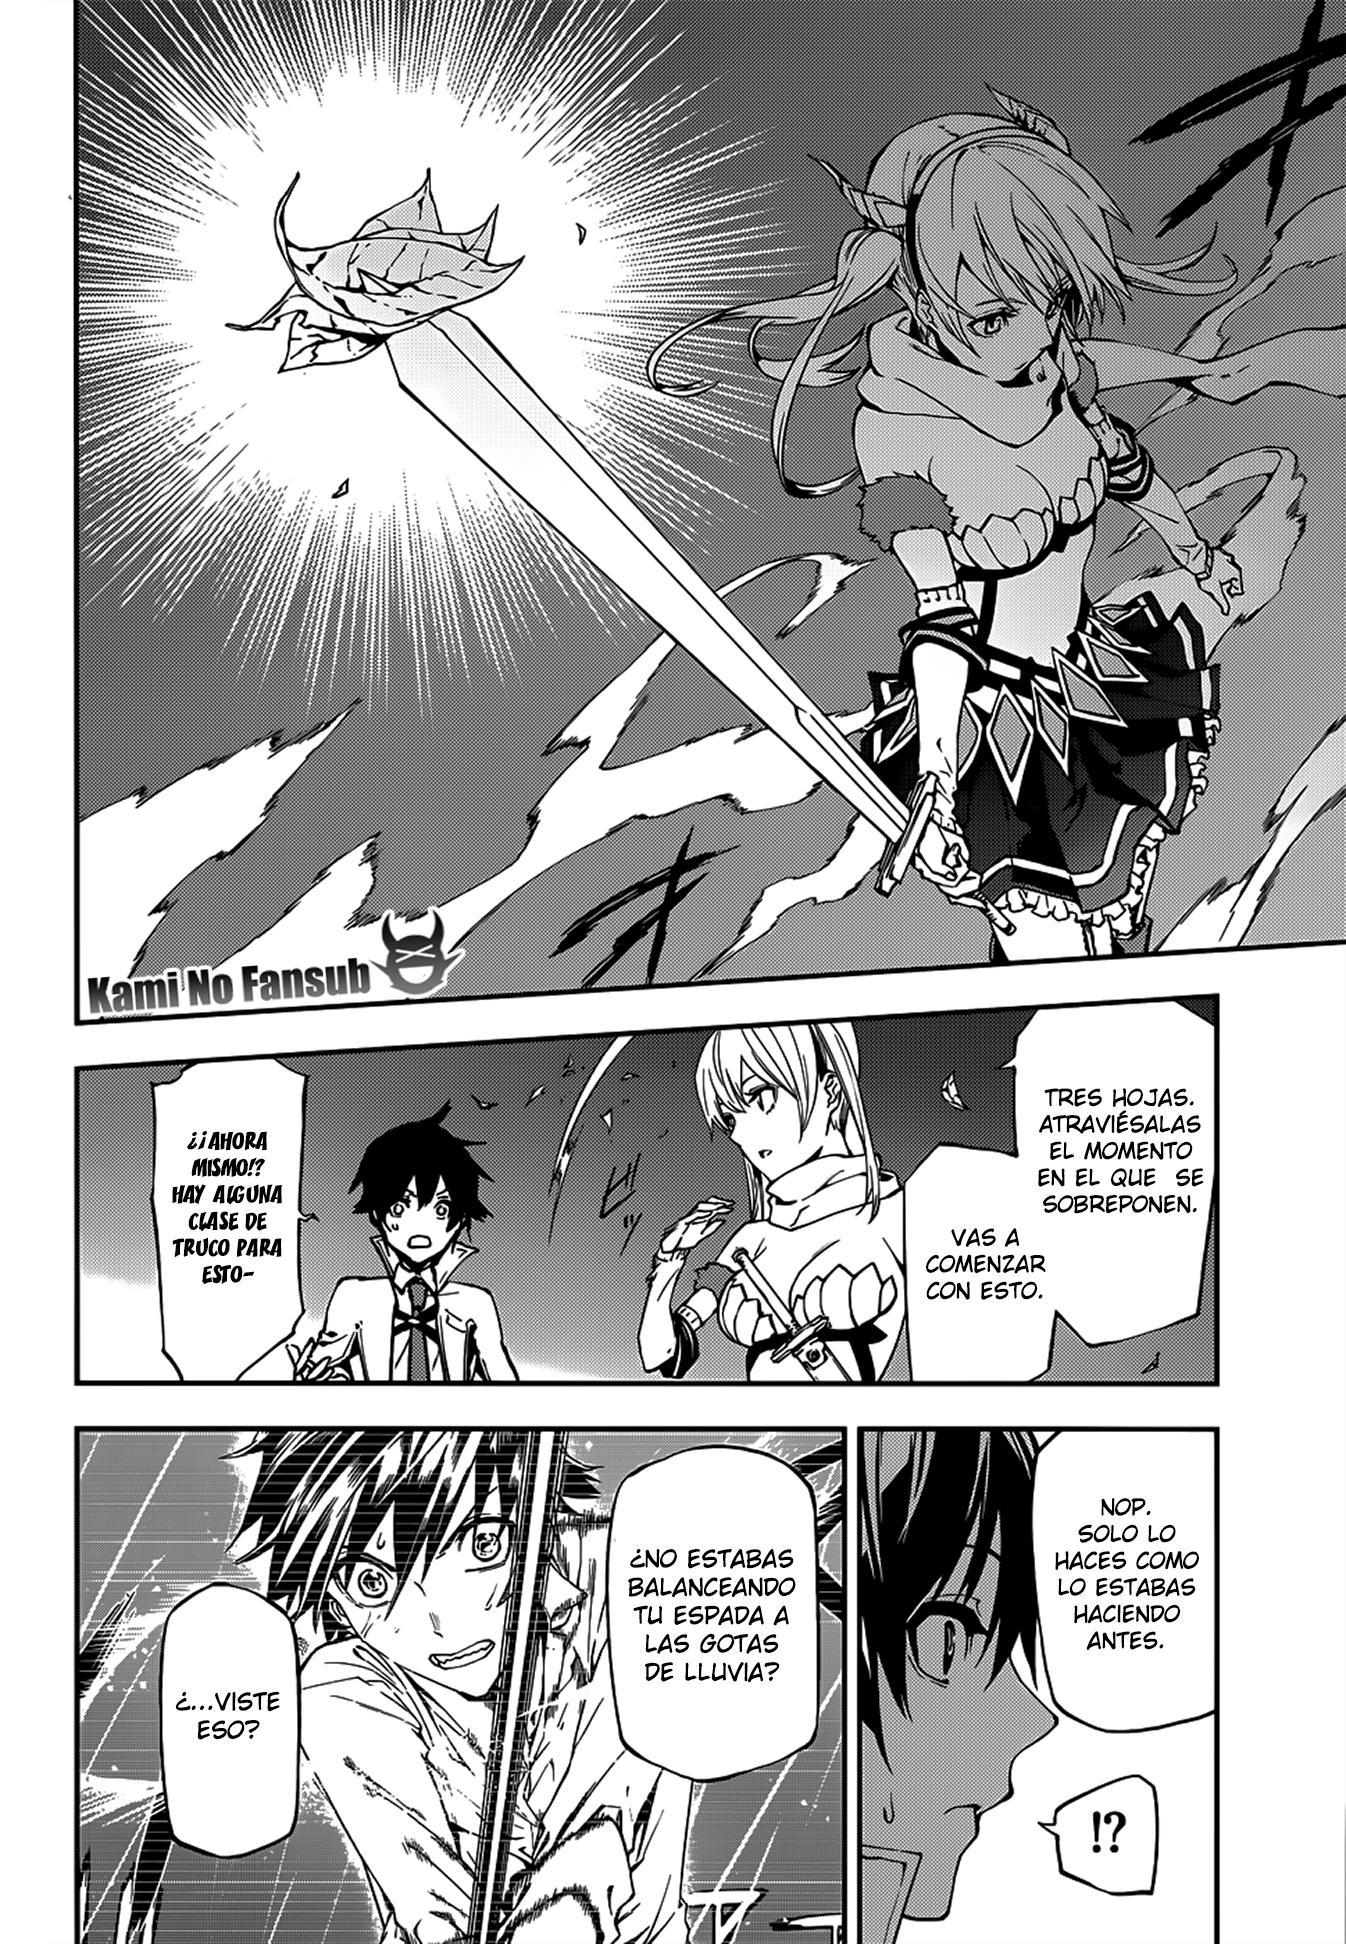 https://c5.ninemanga.com/es_manga/48/18352/438714/8e88f4a56dfe2478620cc53a477b8326.jpg Page 9